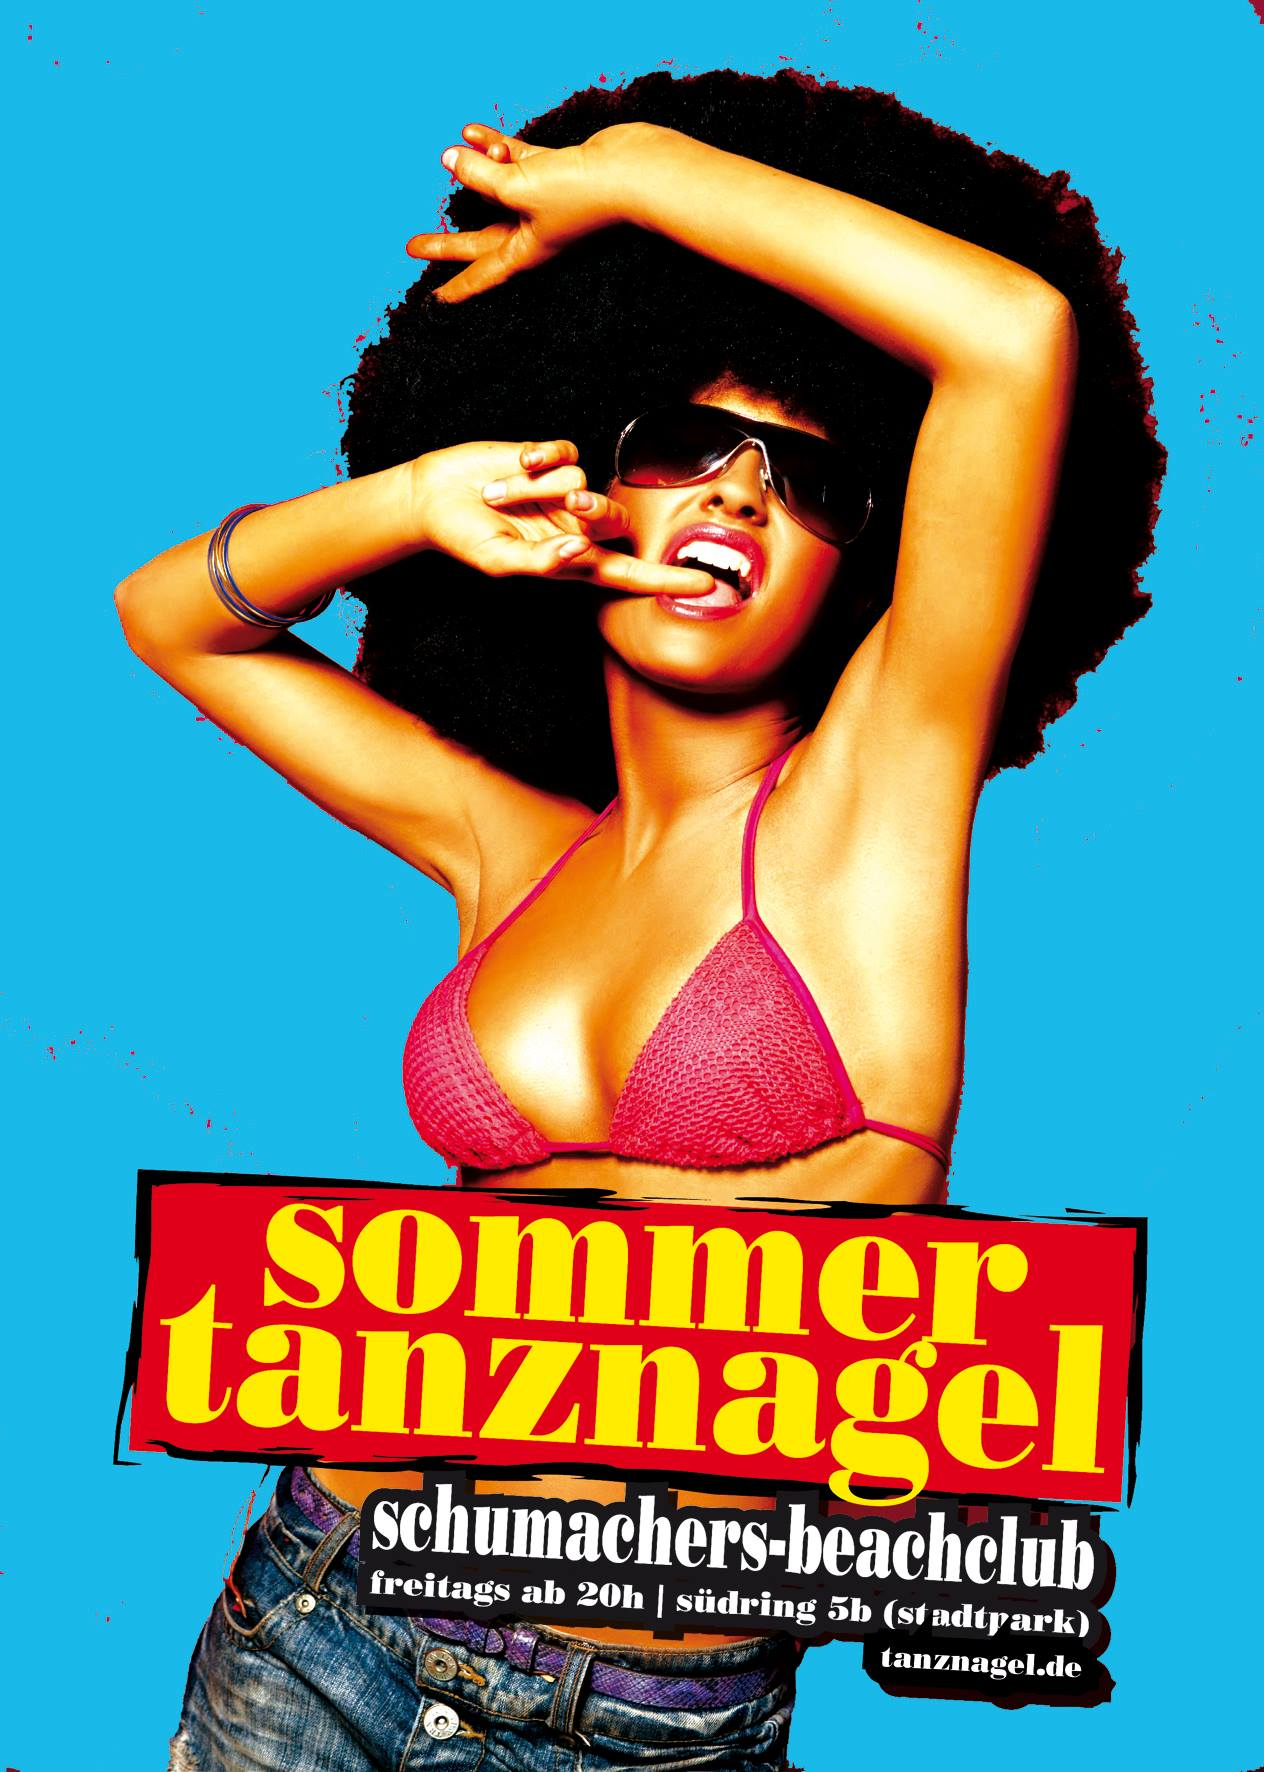 Party in Hamburg: Schumachers Beachclub